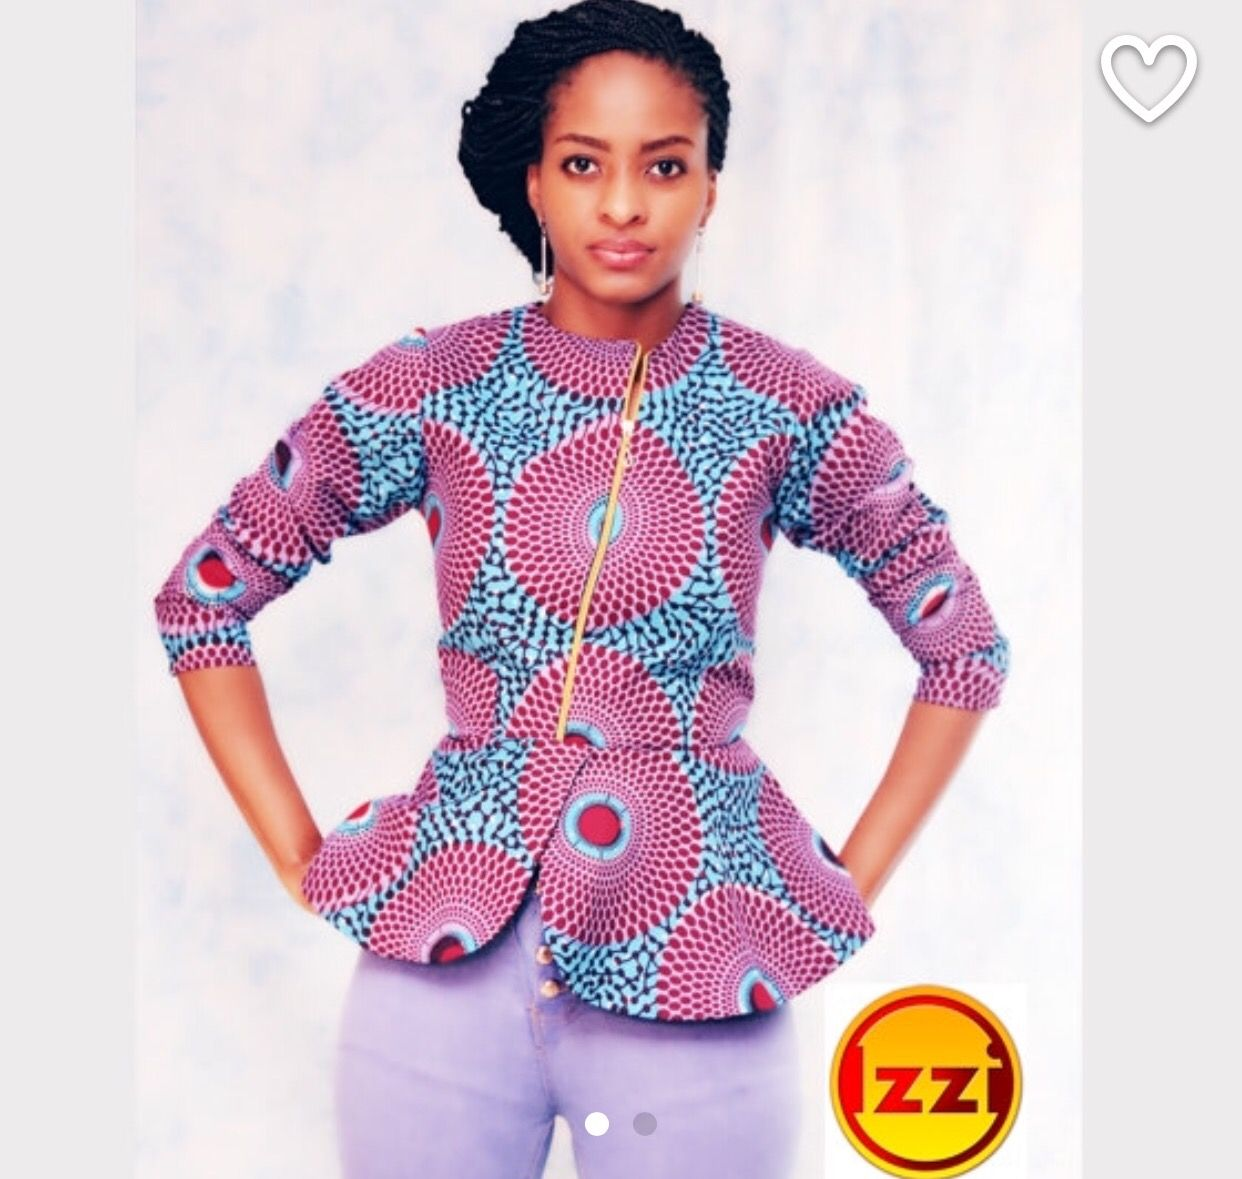 Pin de Sleek Africa en Sleek Ankara Styles | Pinterest | Africanos y ...